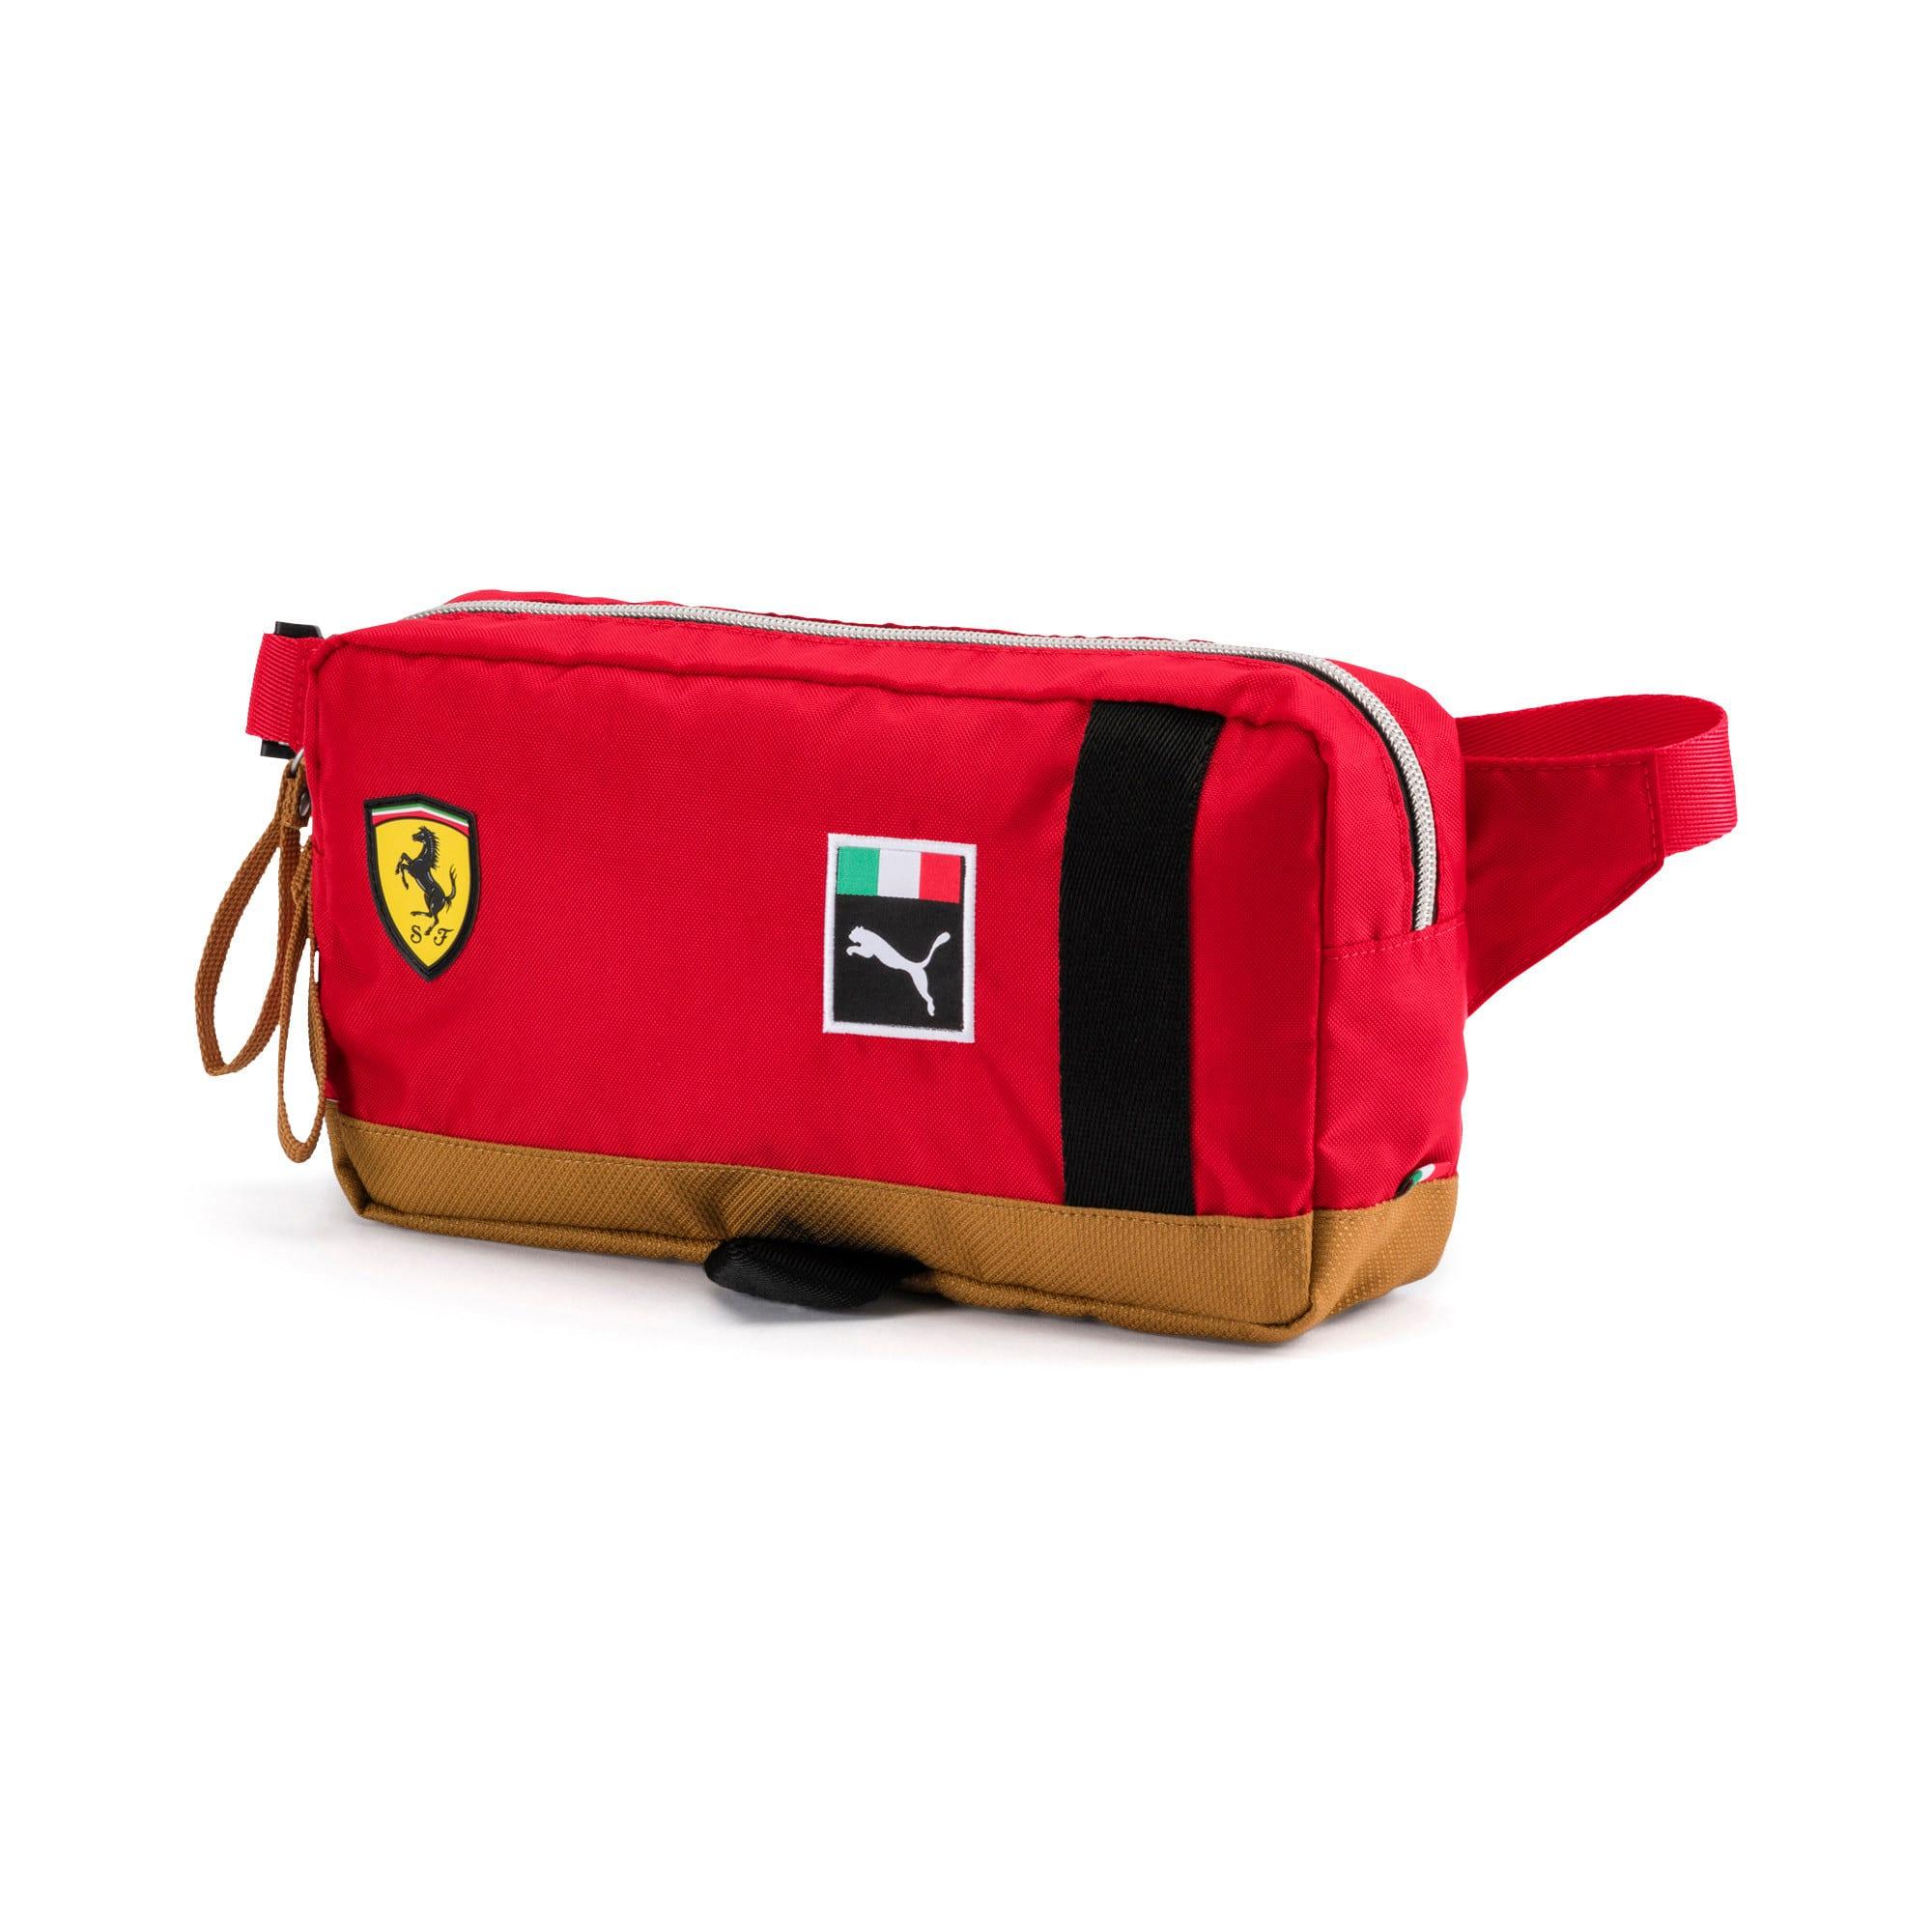 Thumbnail 1 of Scuderia Ferrari Fanwear Waist Bag, rosso corsa-Puma Black, medium